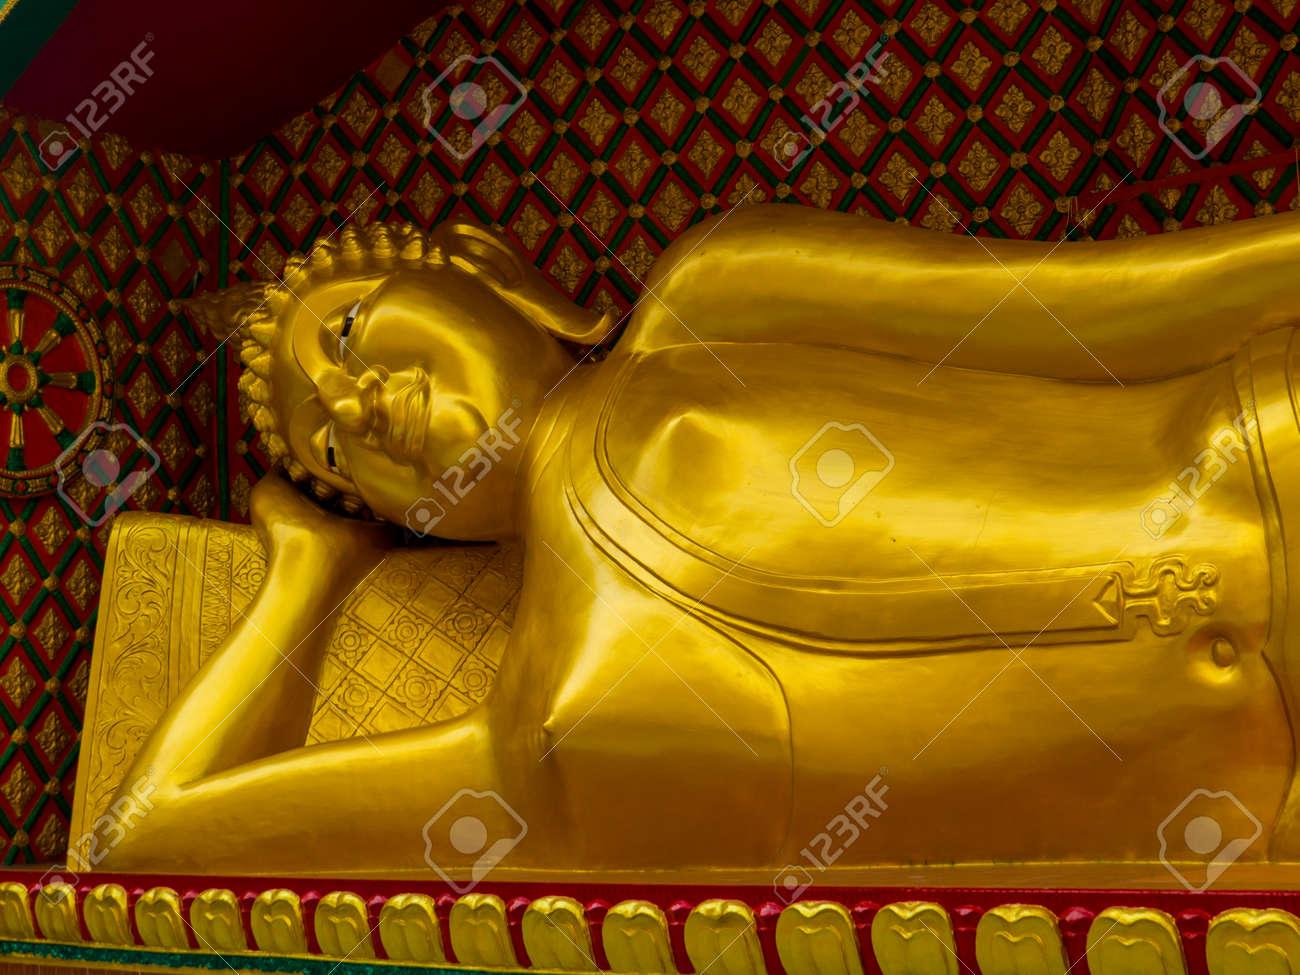 Bangkok, Thailand - January 16, 2020: View of the reclining Buddha in the Wat Sitaram. - 151449104